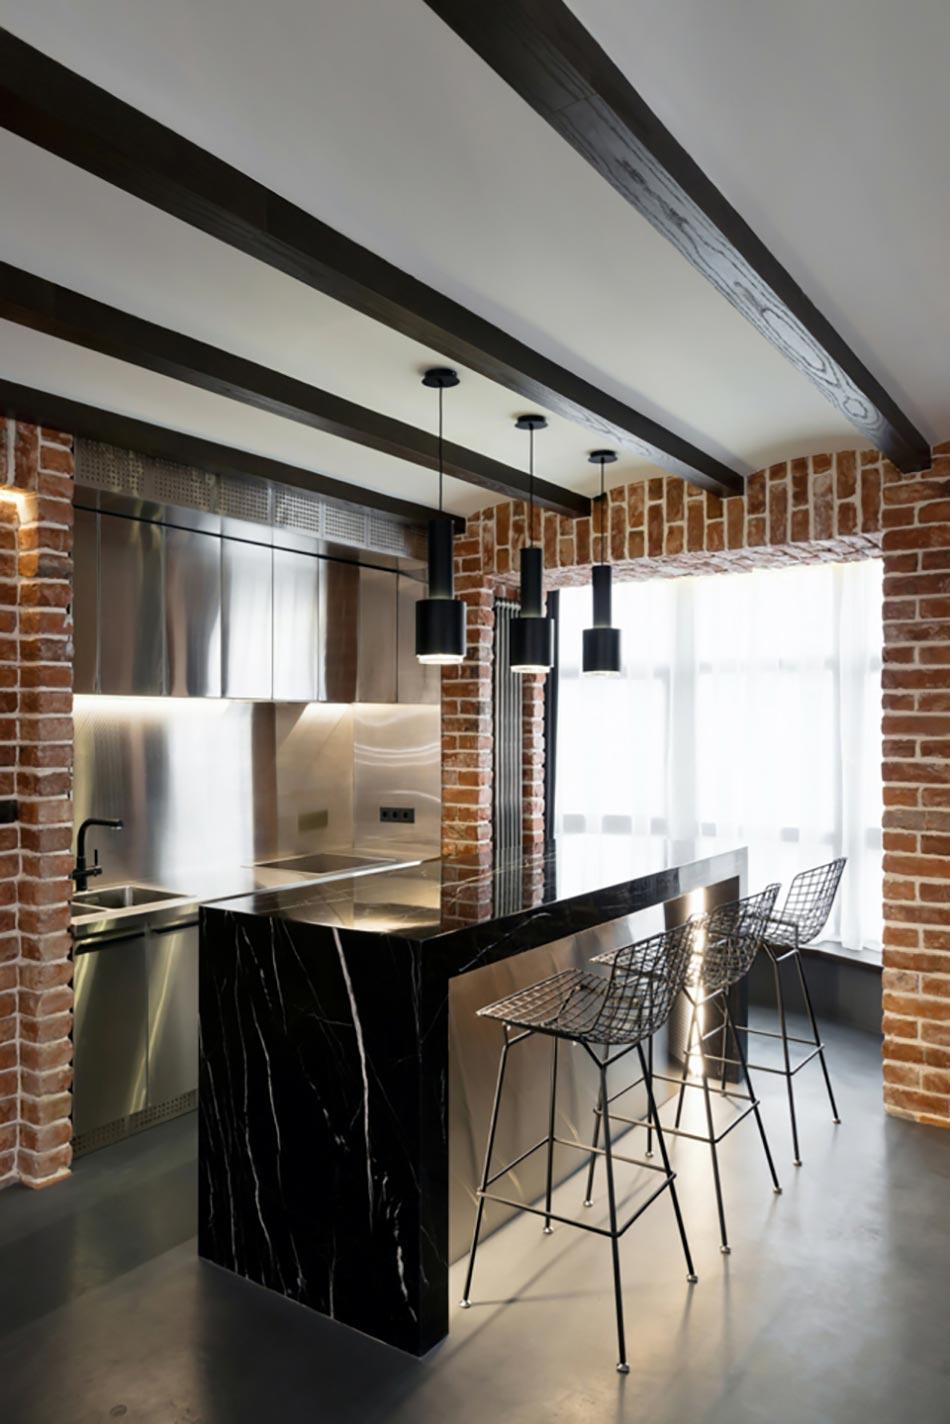 petite cuisine style industriel. Black Bedroom Furniture Sets. Home Design Ideas